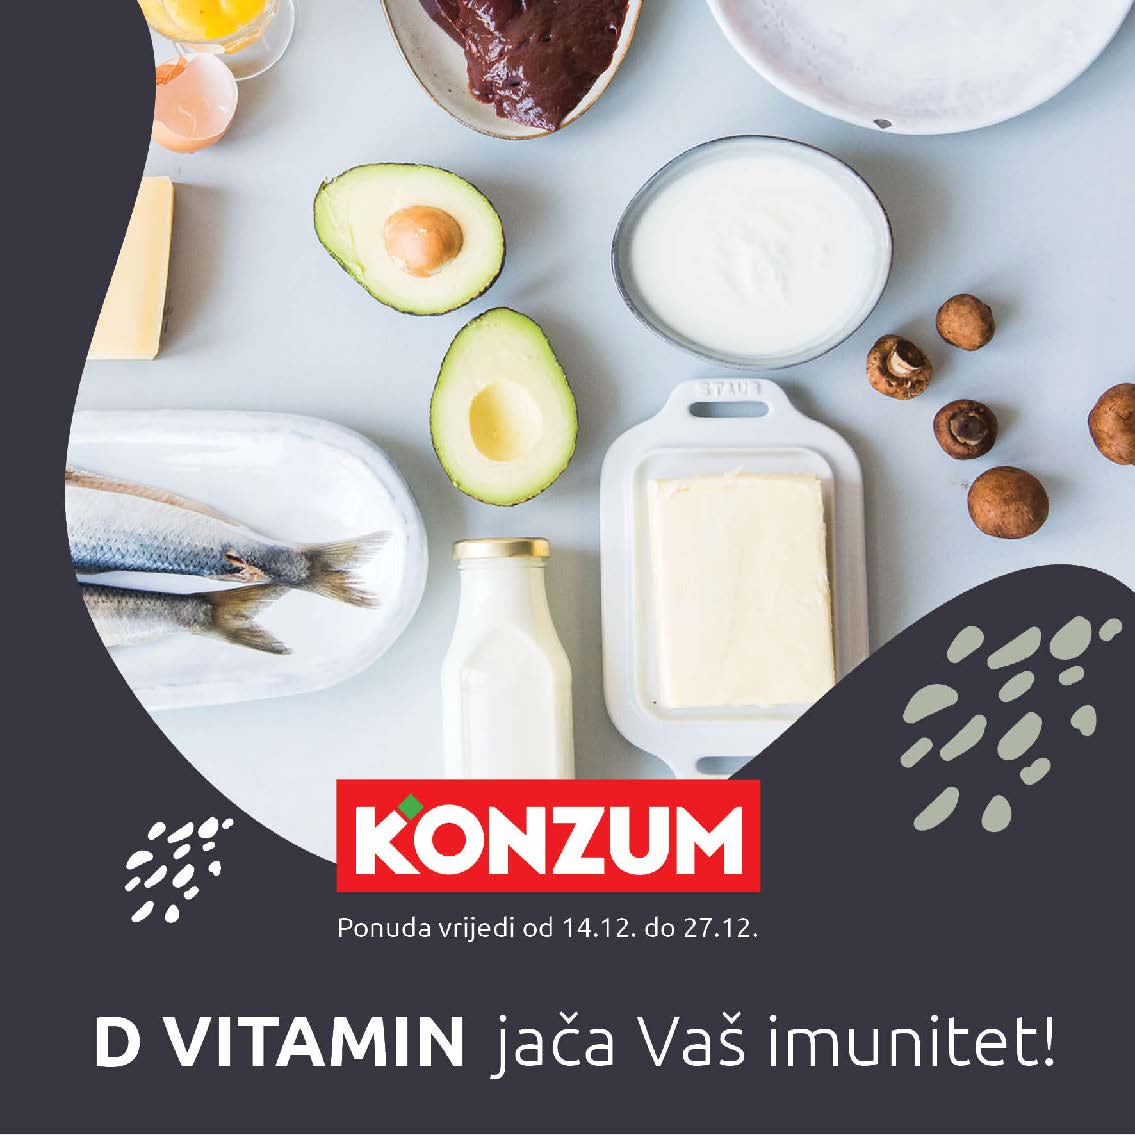 KONZUM Katalog D VITAMIN jača vaš imunitet I 14.12.2020. 27.12.2020. Page 01